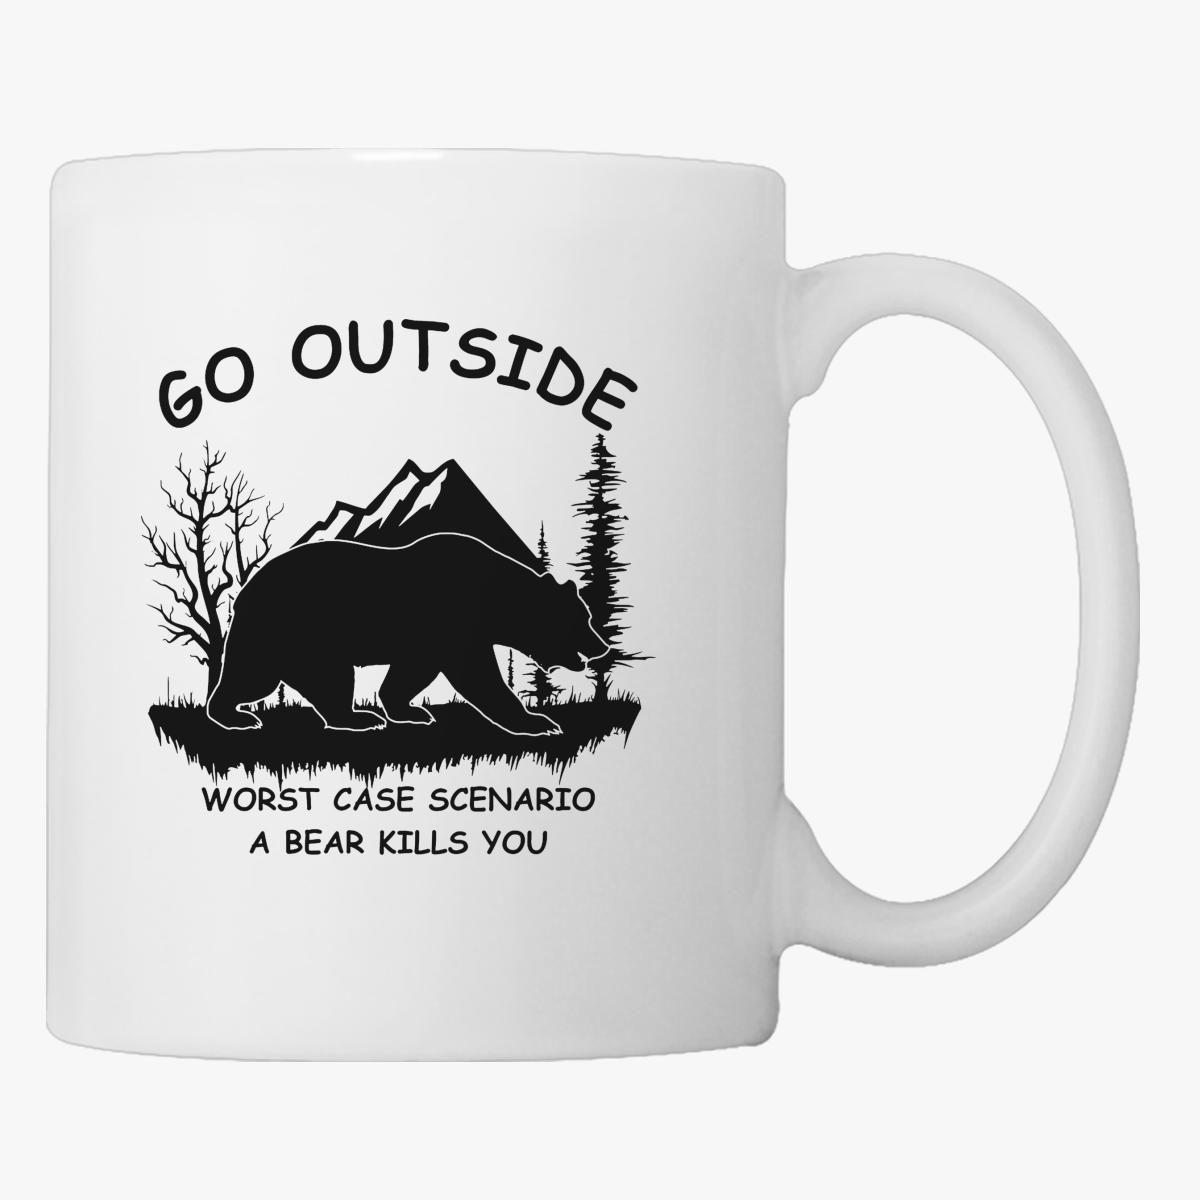 A Outside Go Customon You Coffee Bear Worst Kills Scenario Mug Case byY76fgv